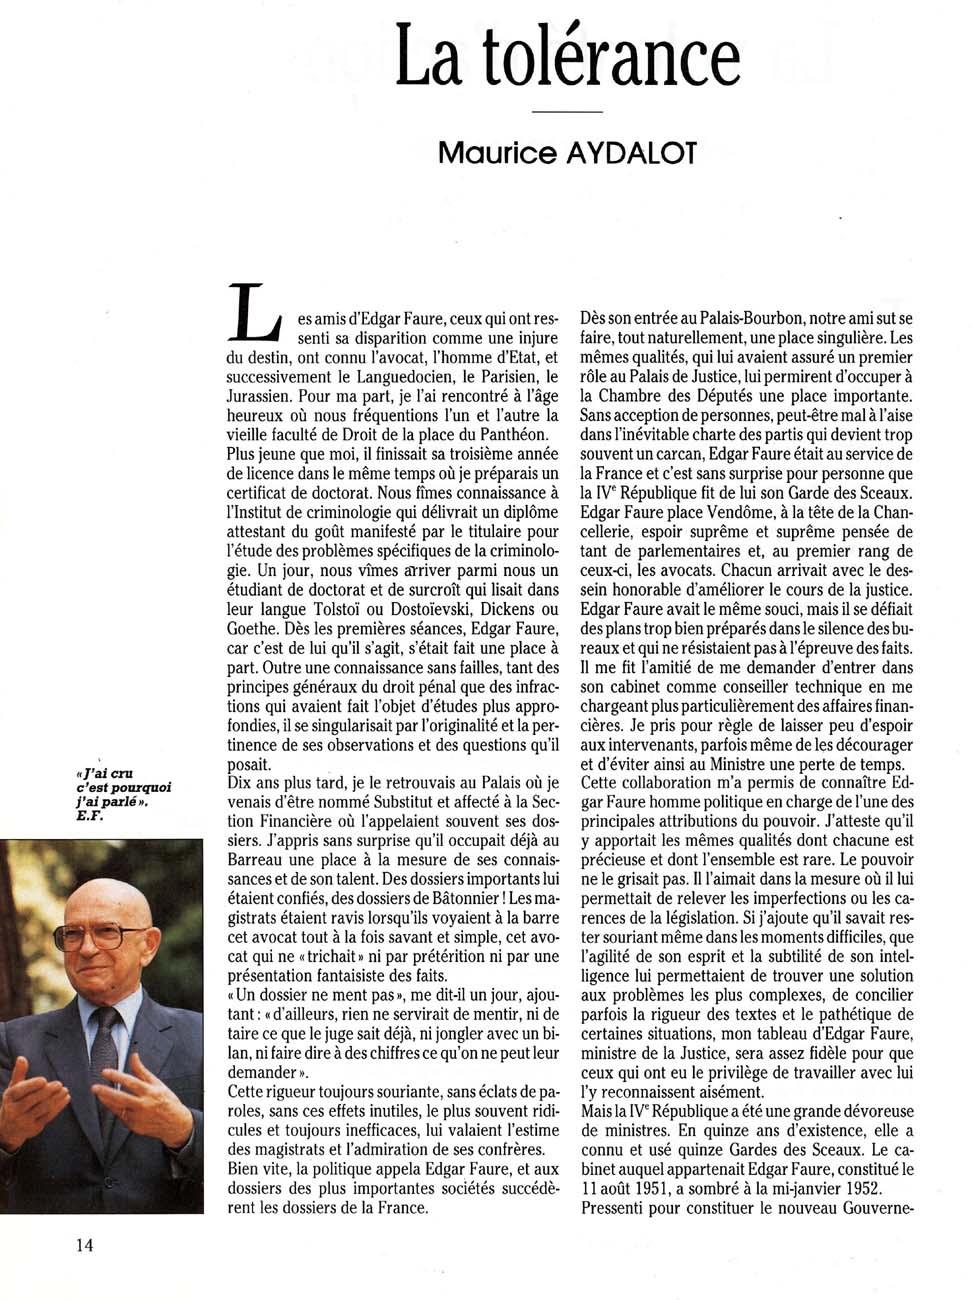 La tolérance (Maurice Aydalot)